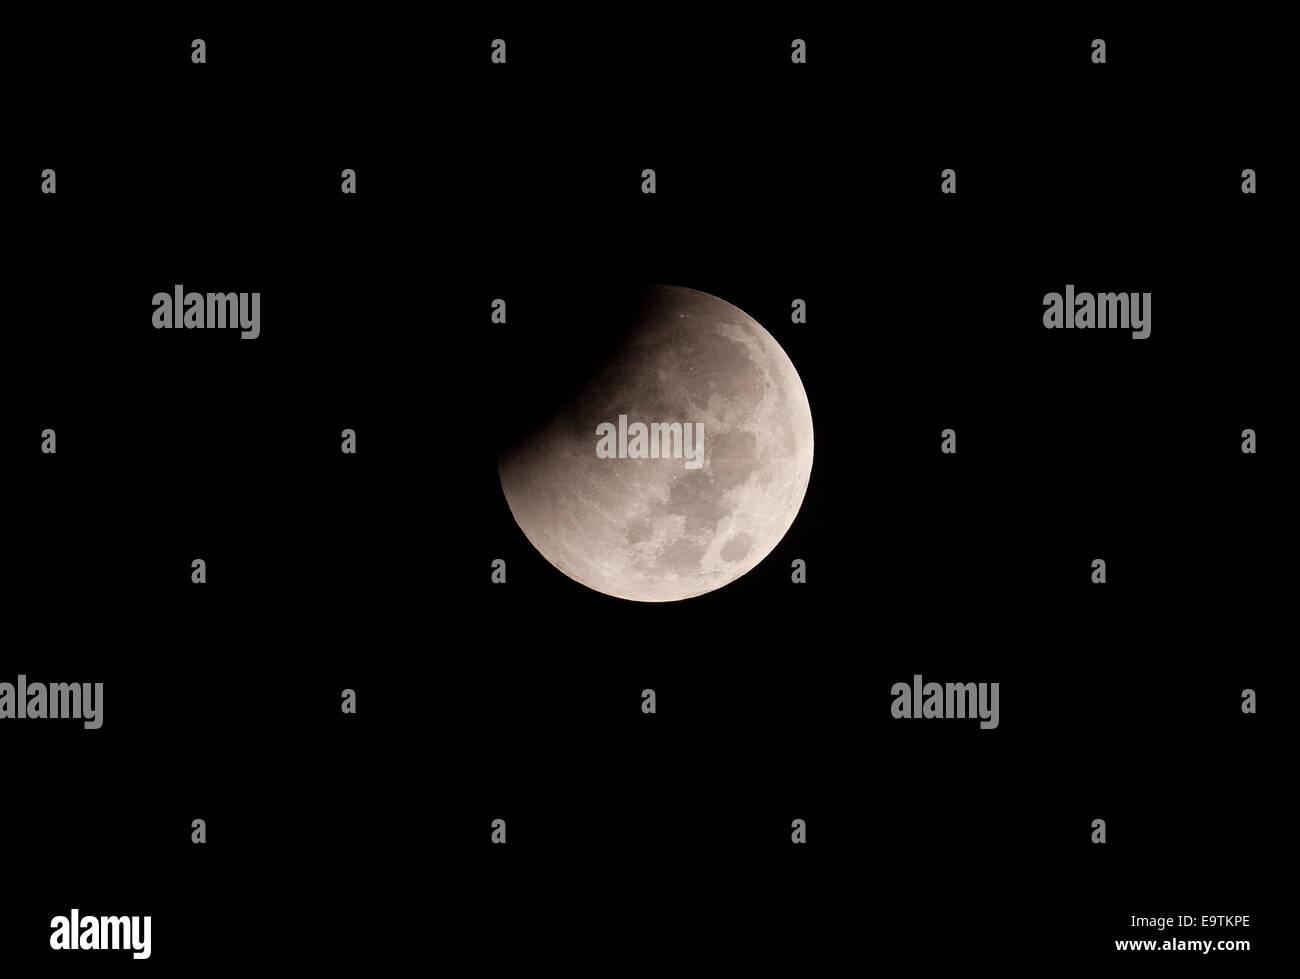 lunar eclipse space center - photo #25